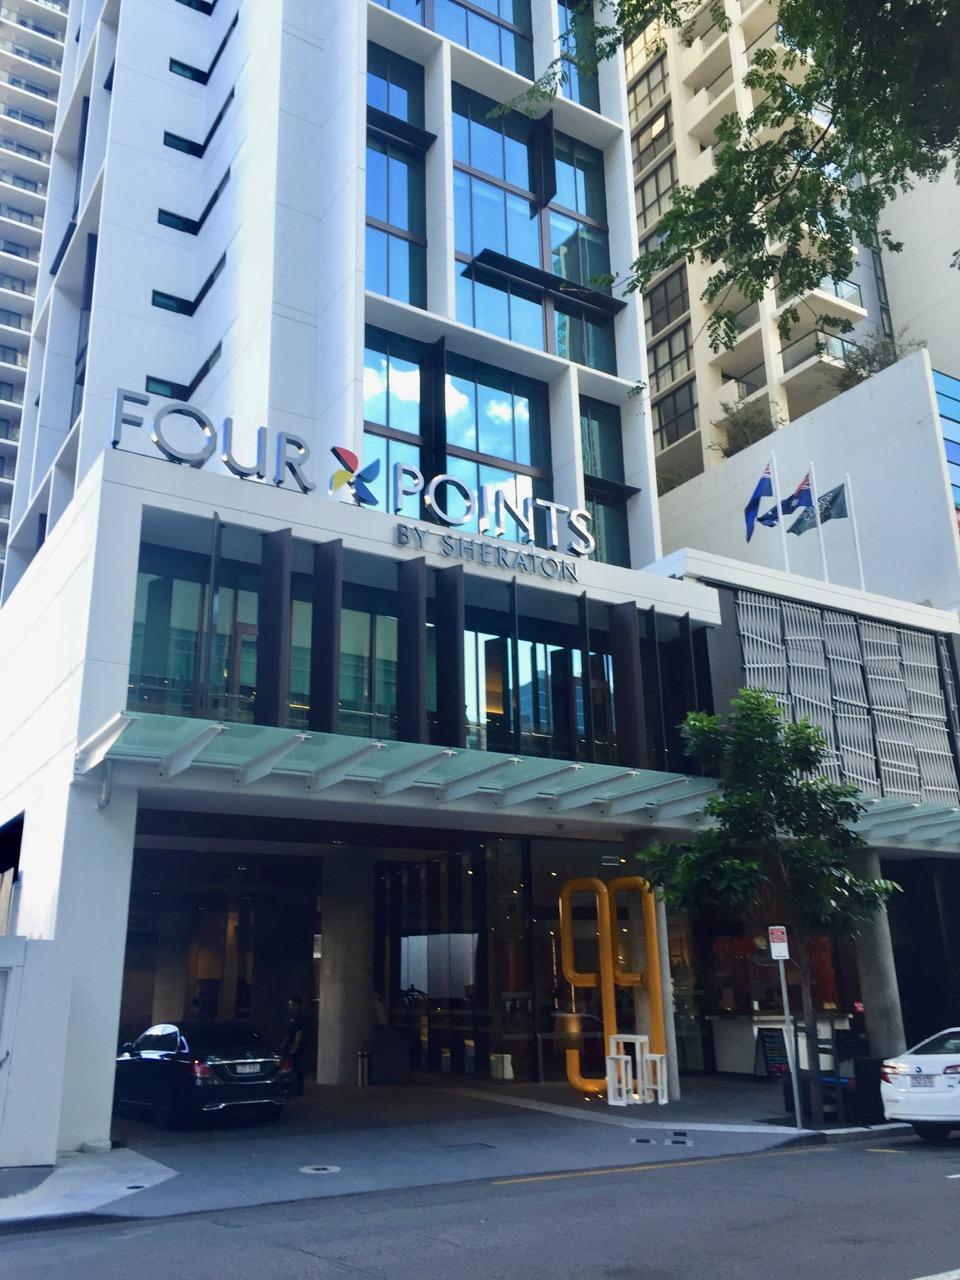 Four Points by Sheraton Brisbane | Point Hacks